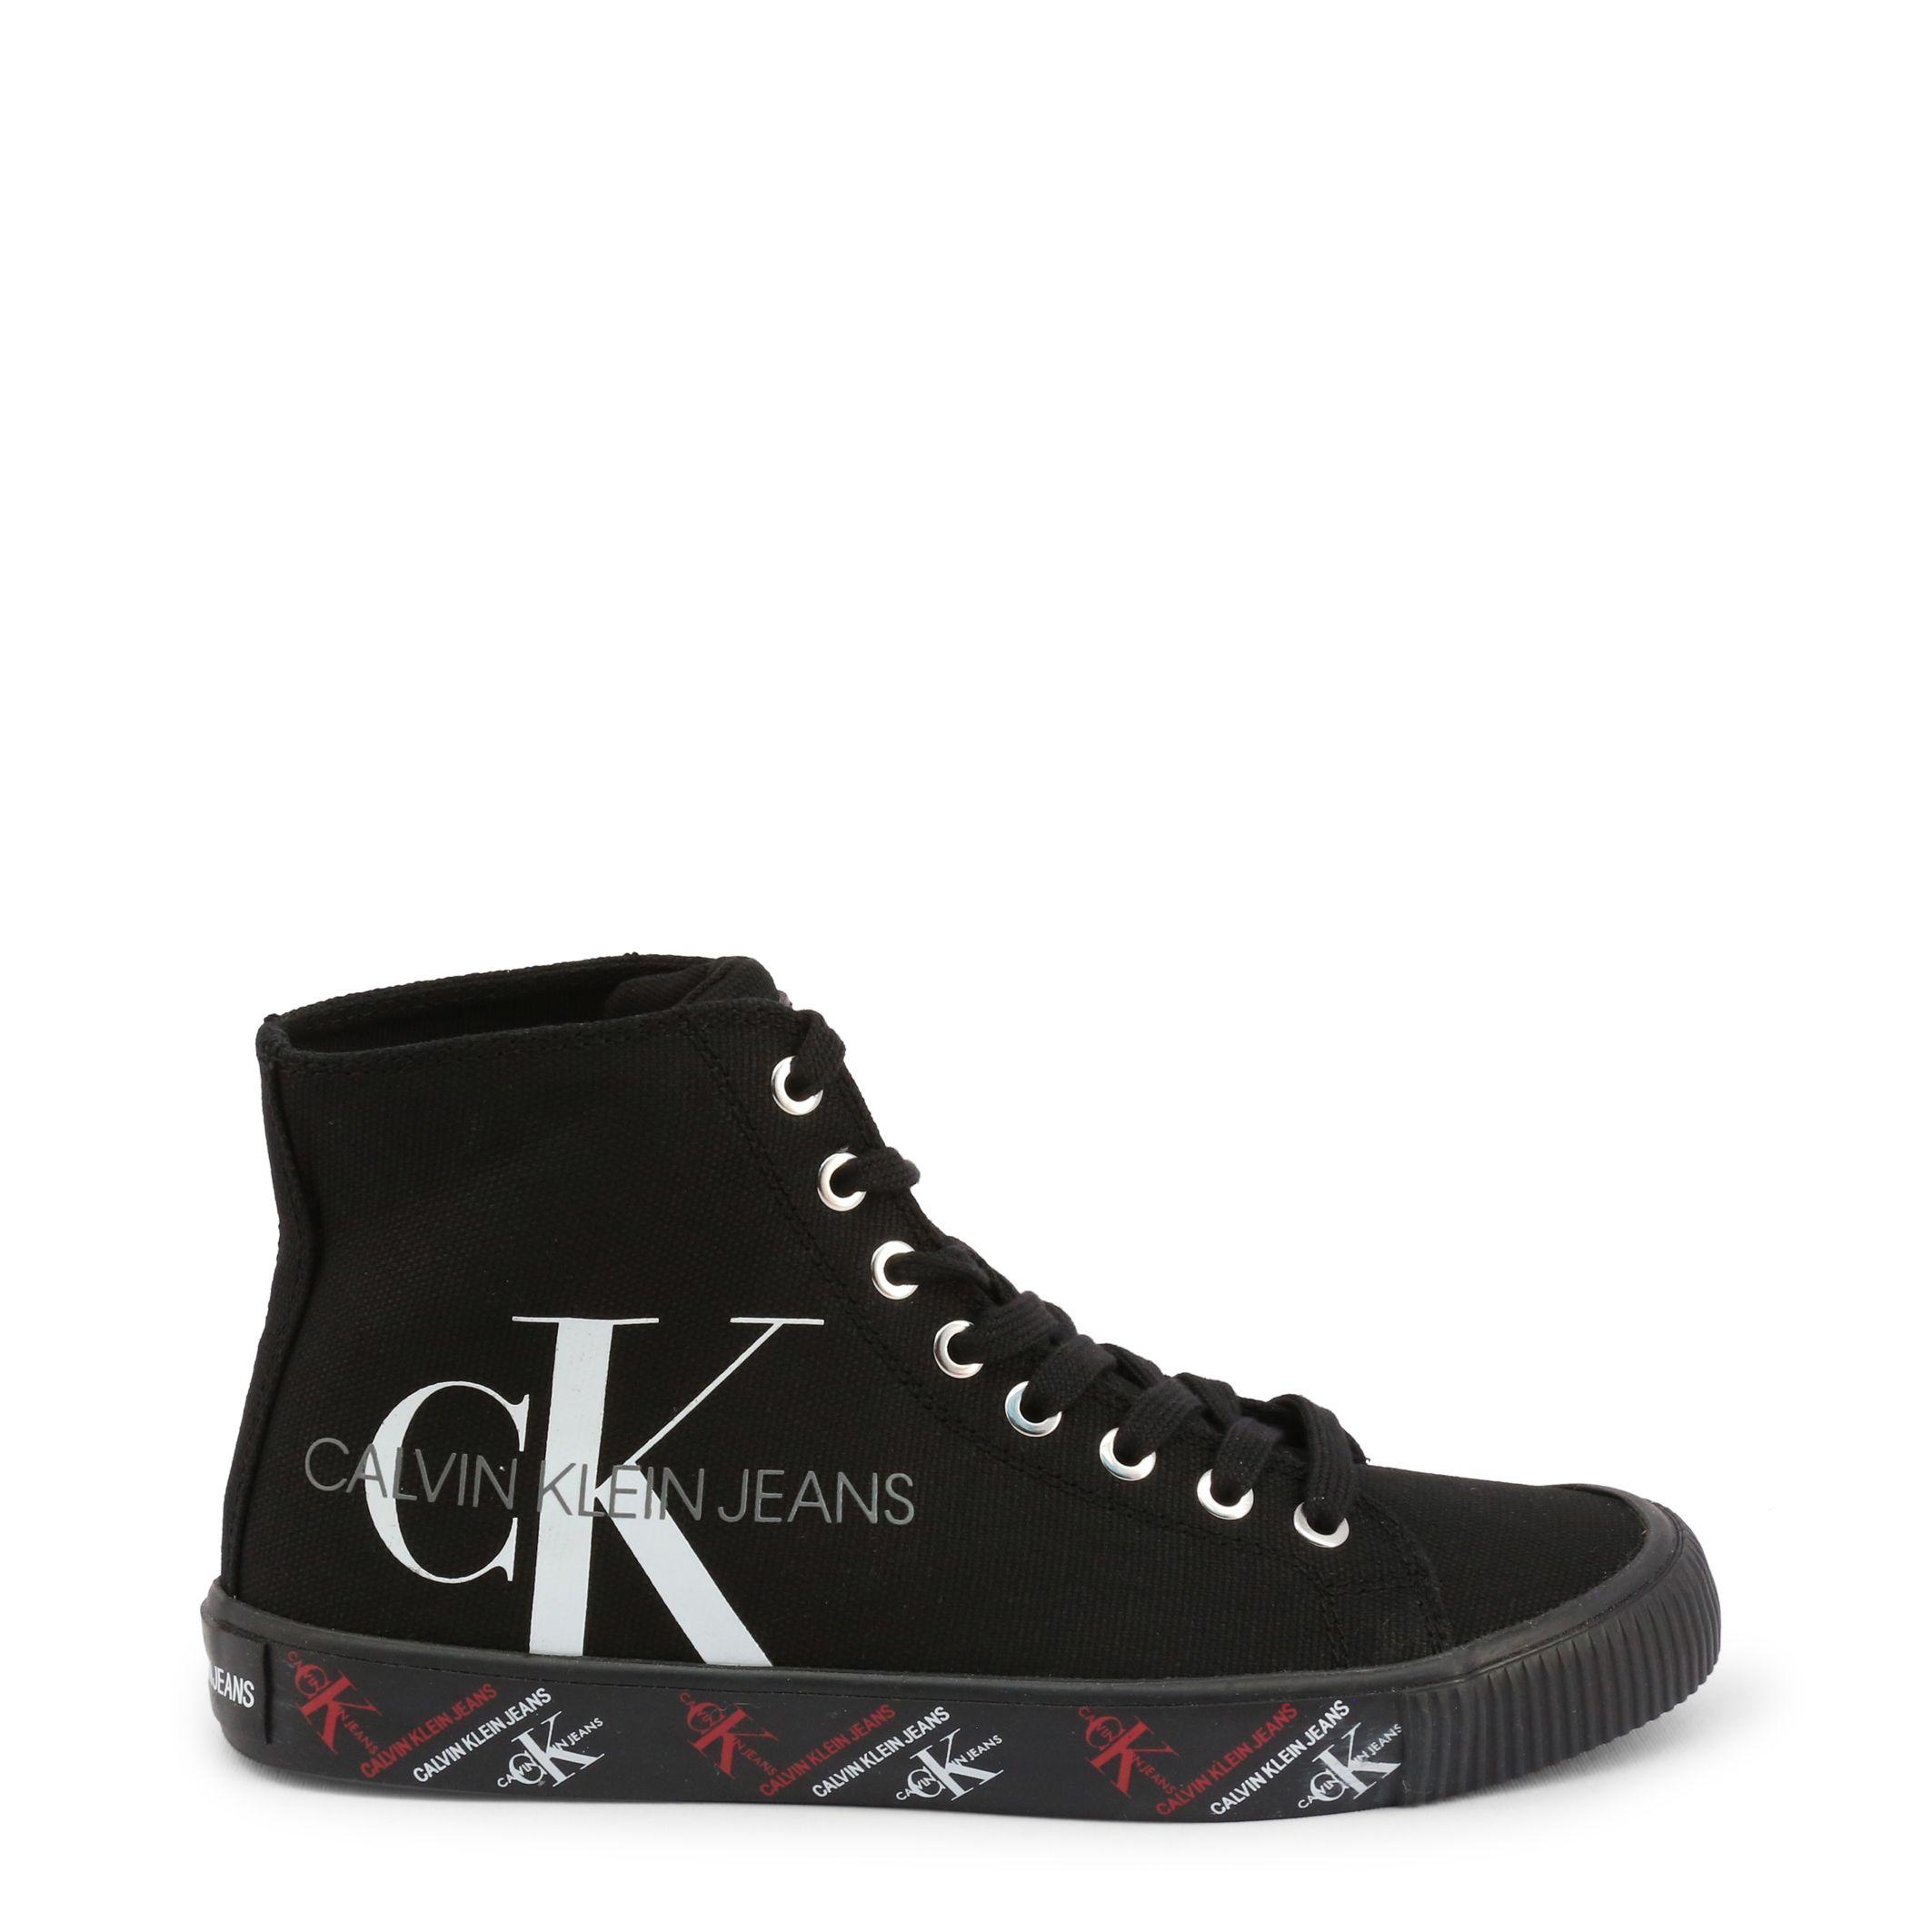 Calvin Klein – DANZA_B4R0894 – Negro